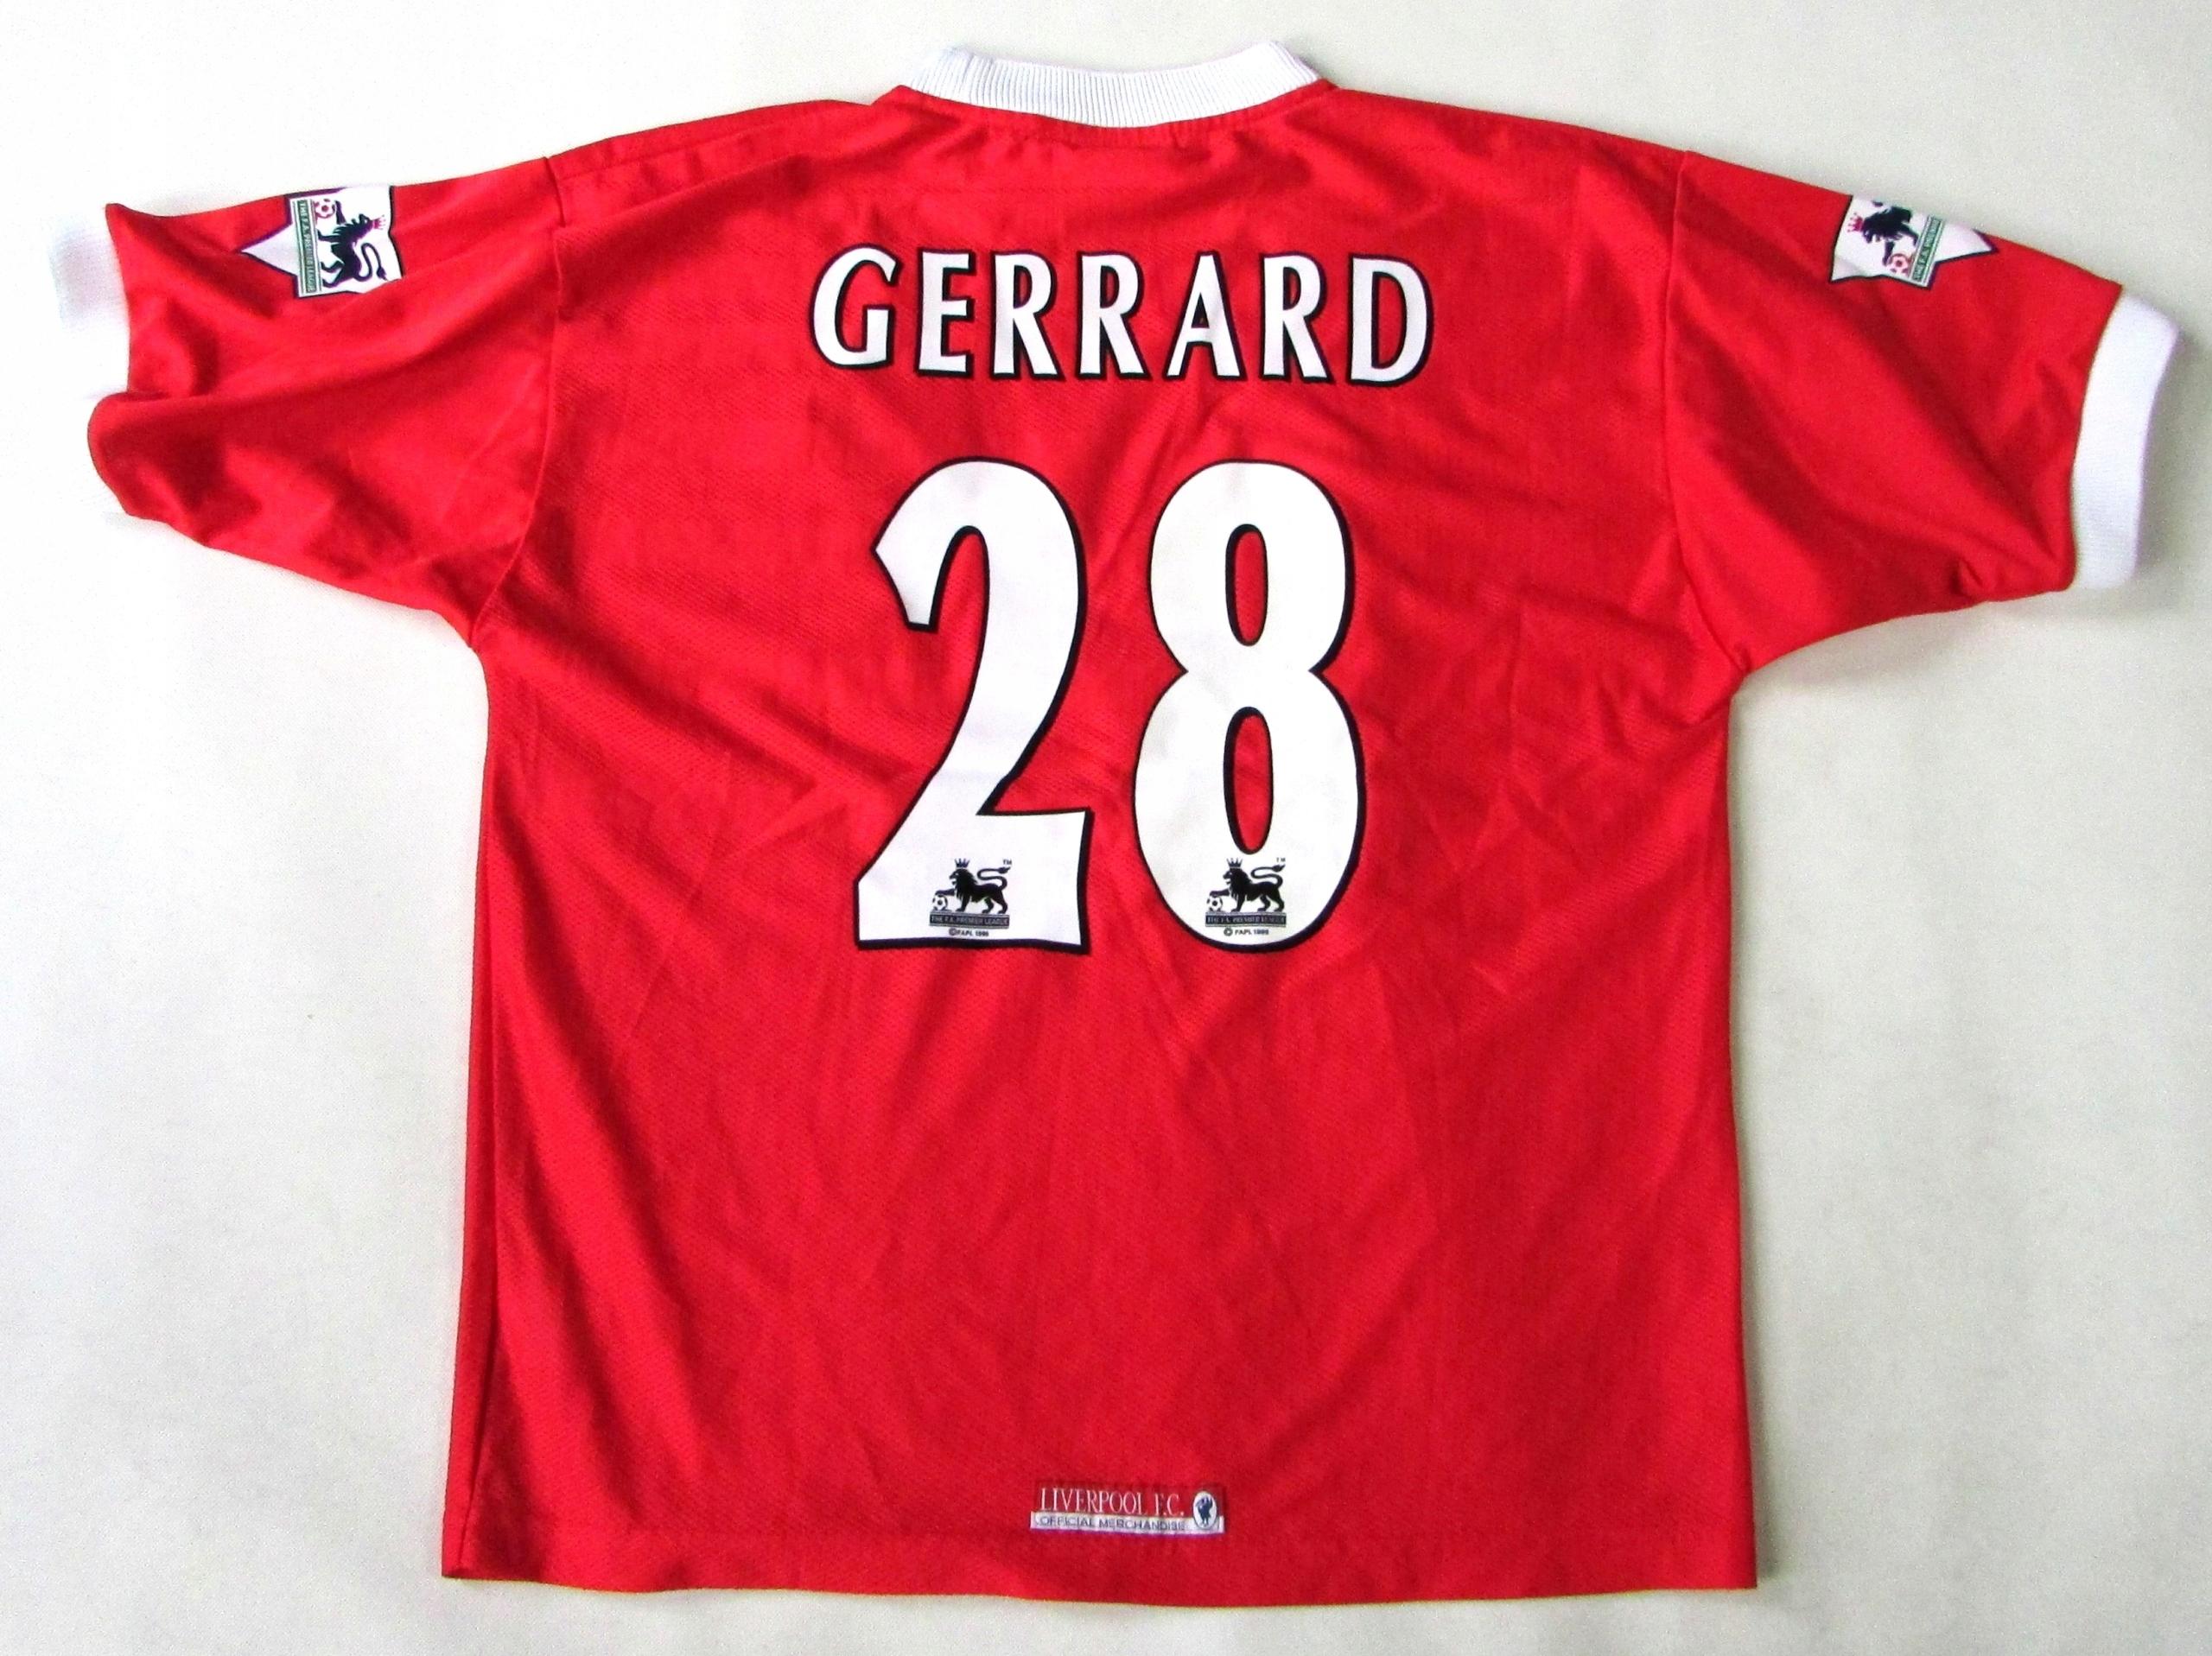 LIVERPOOL FC_Oficjalna_S. GERRARD__1998-2000_IDEAŁ